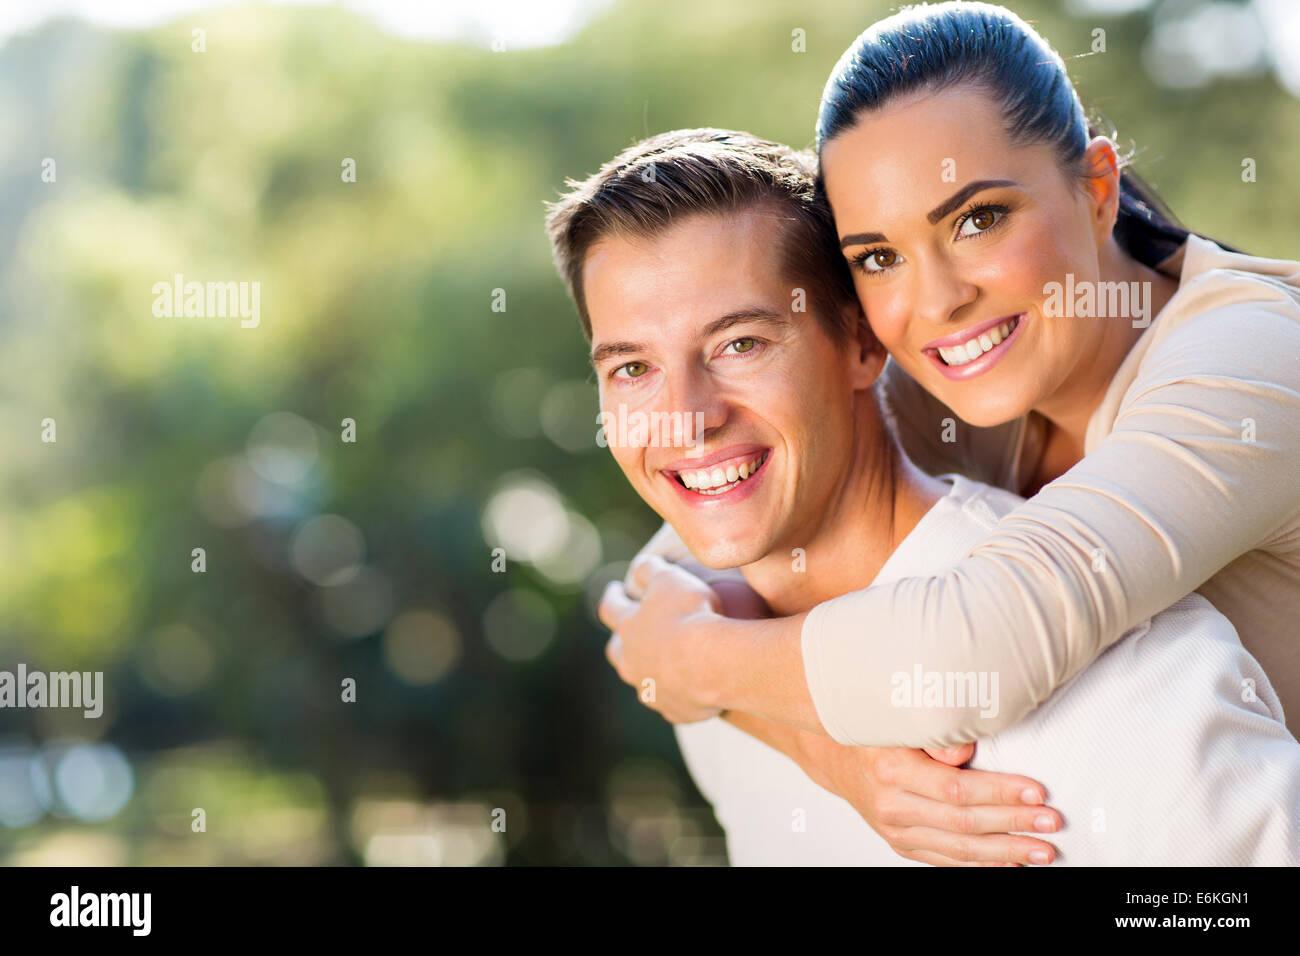 happy woman enjoying piggyback ride on boyfriends back outdoors - Stock Image